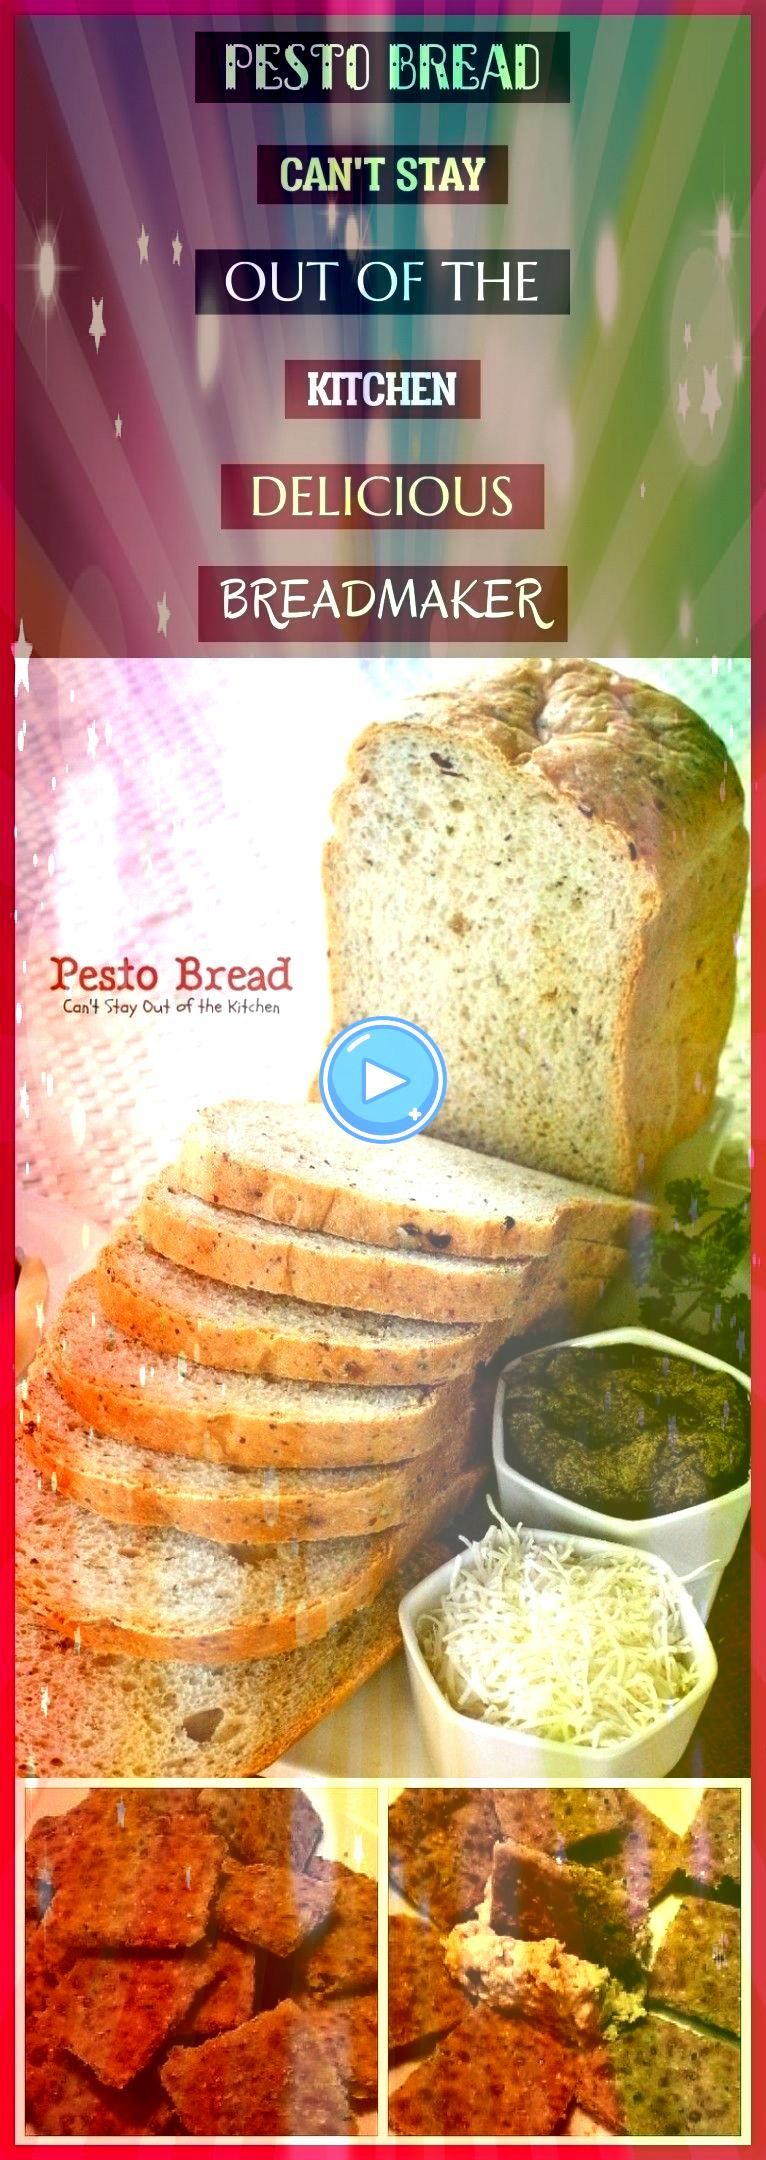 Bread Cant Stay Out Of The Kitchen Delicious Breadmaker  pestobrot kann nicht aus der küche heraus bleiben delicious breadmaker Pesto Bread Cant Stay Out Of The Kitc...